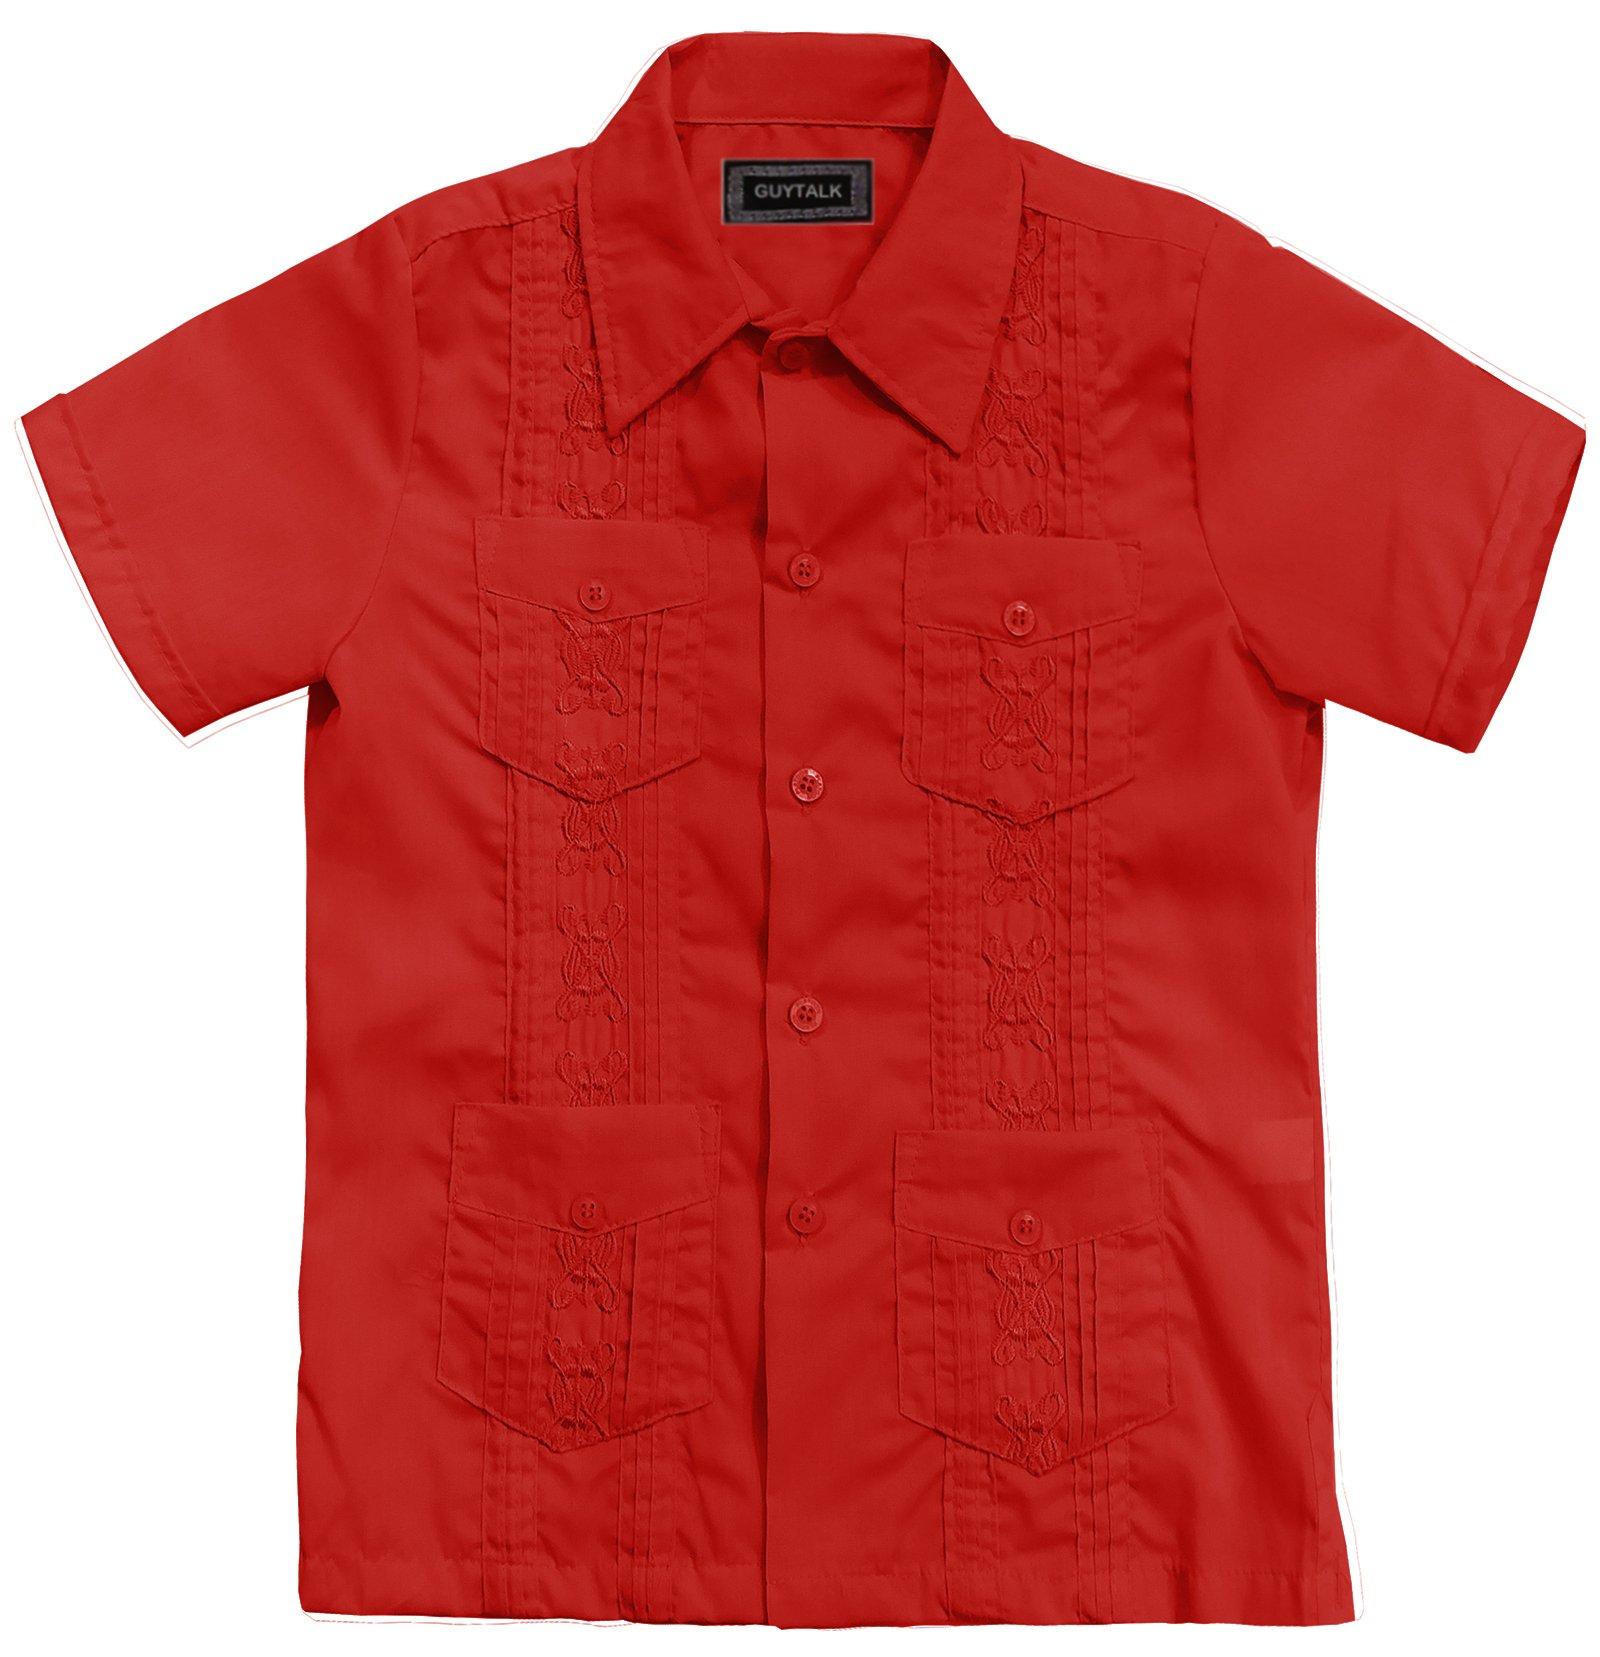 Guytalk Kids Boys' Guayabera Short Sleeve Shirt Red-4